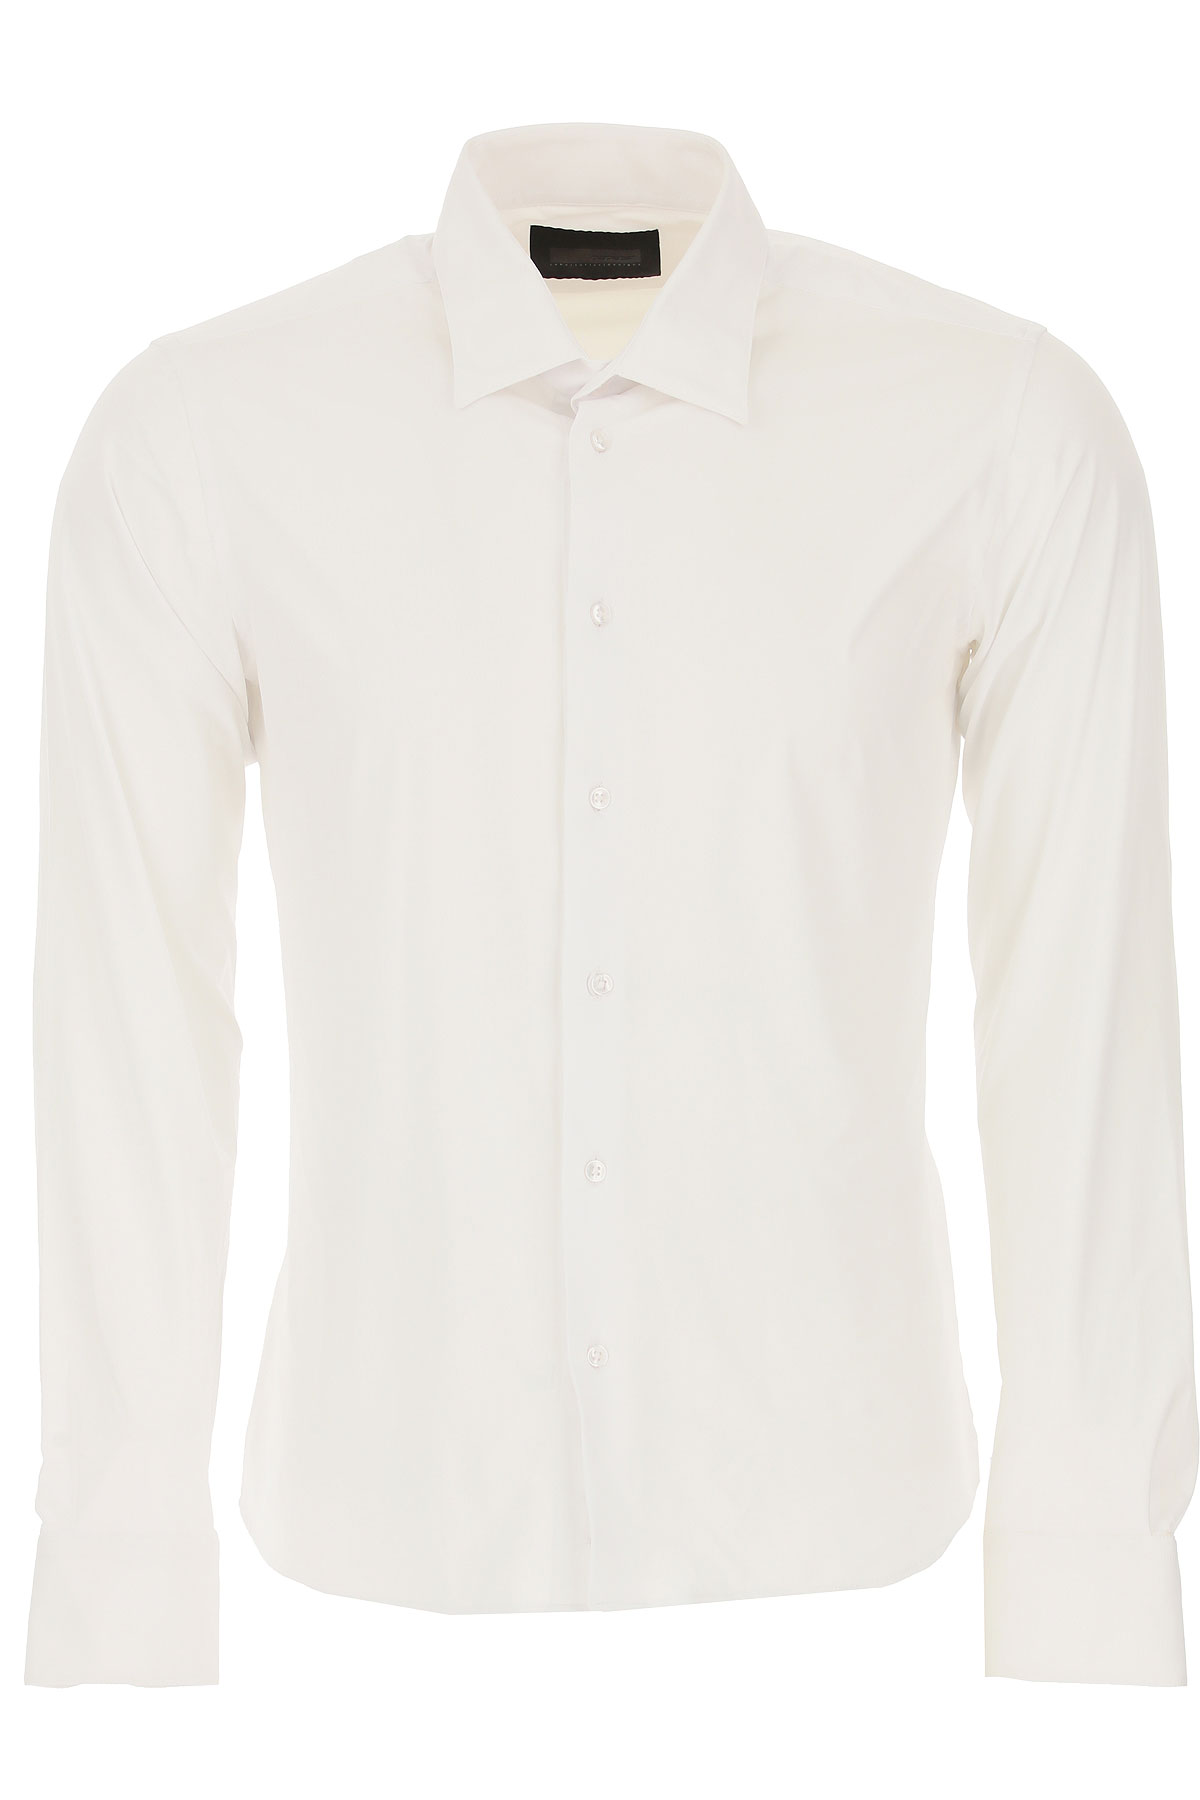 RRD Shirt for Men On Sale, White, polyamide, 2019, L